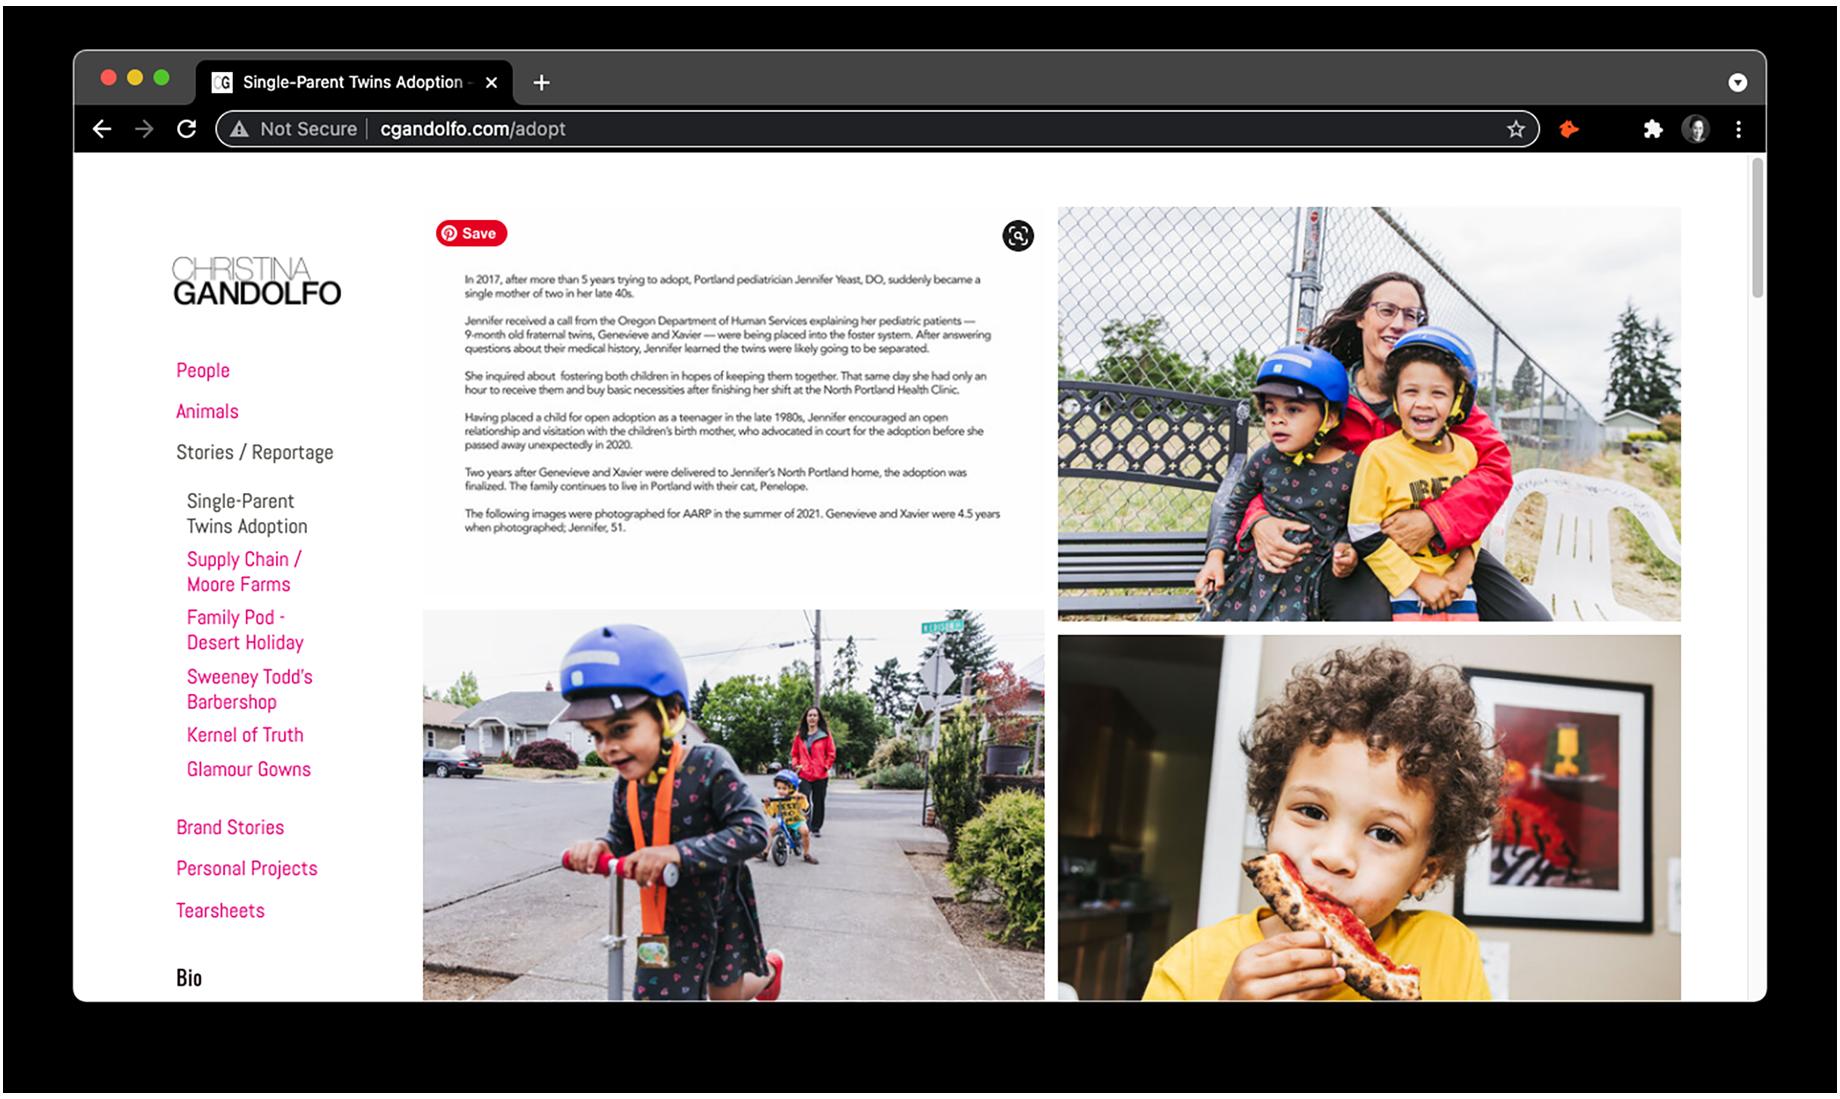 The final project edit on Christina Gandolfo's website by Jemma Dilag